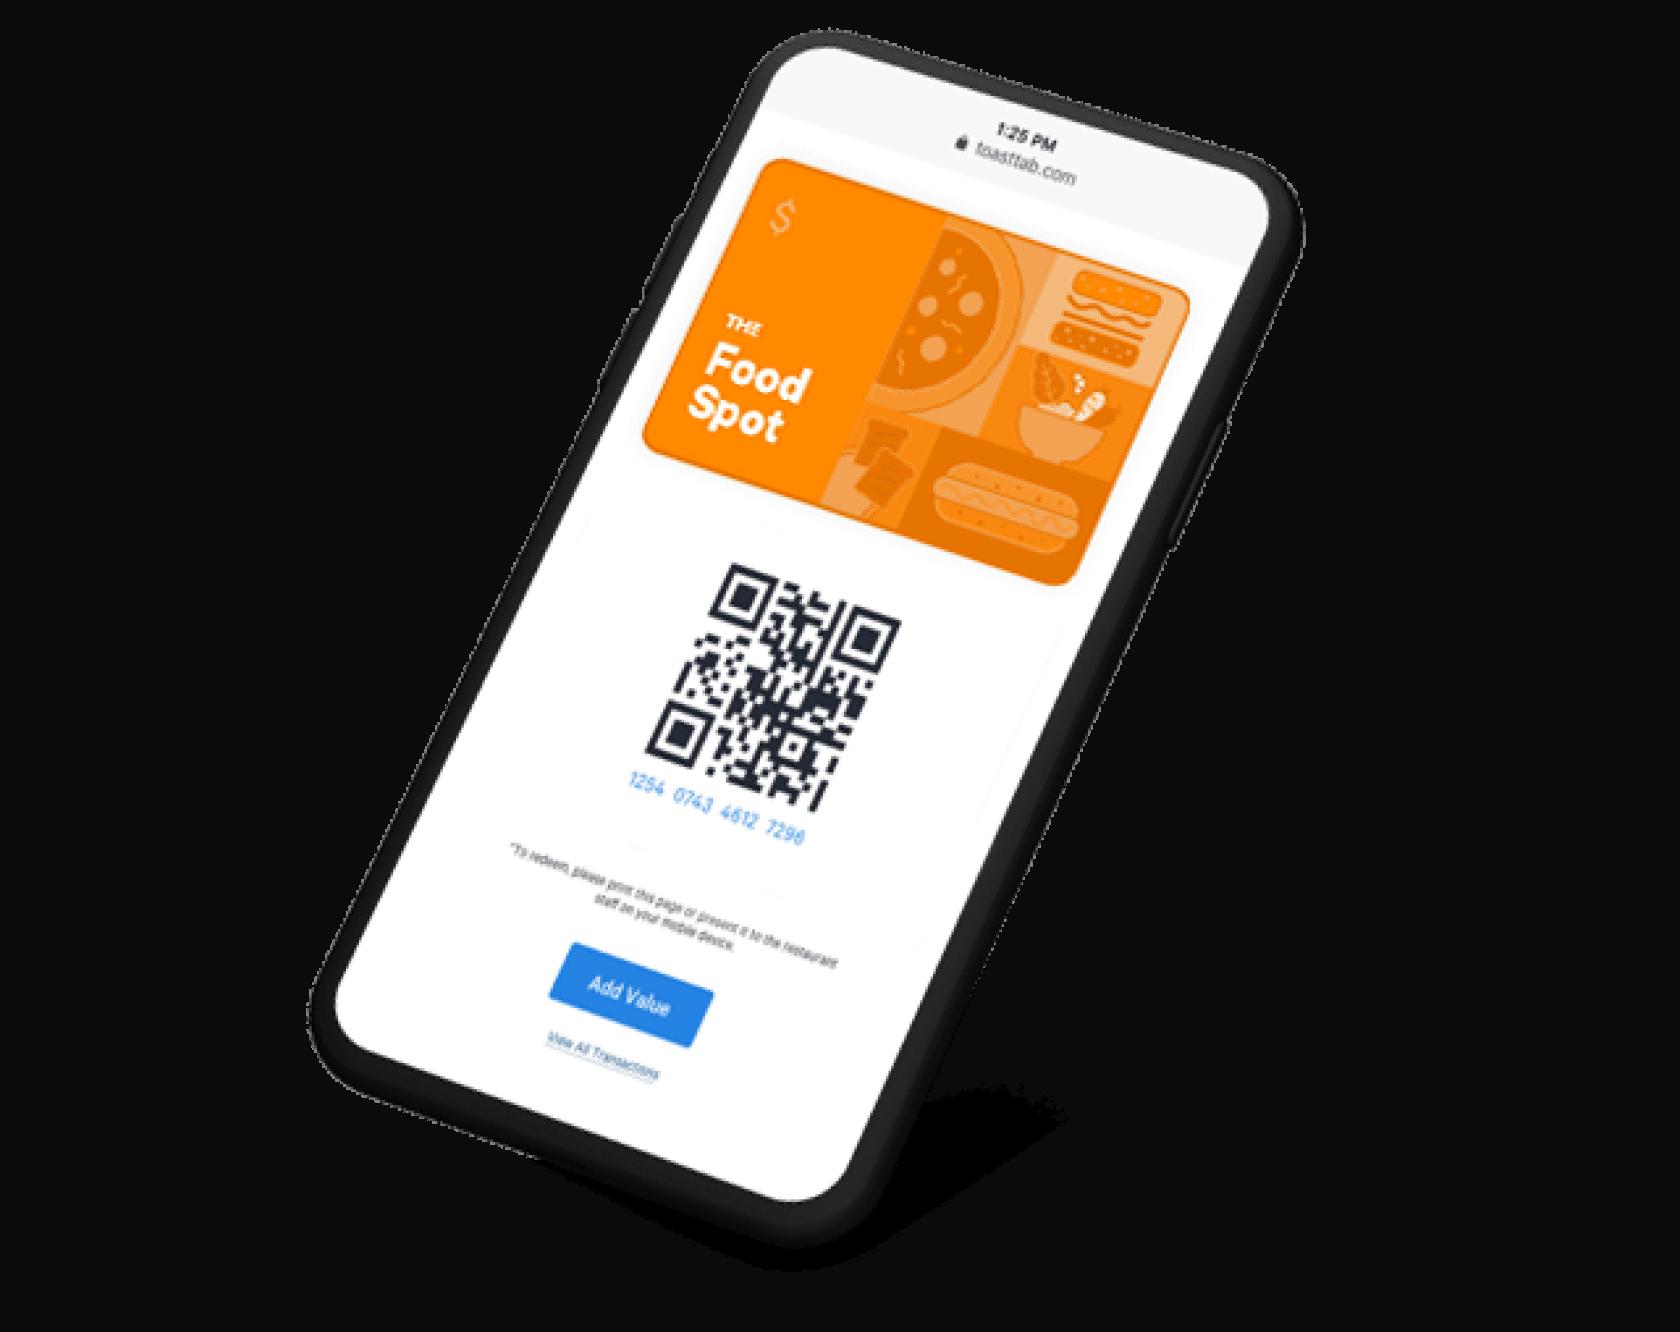 toast digital gift card